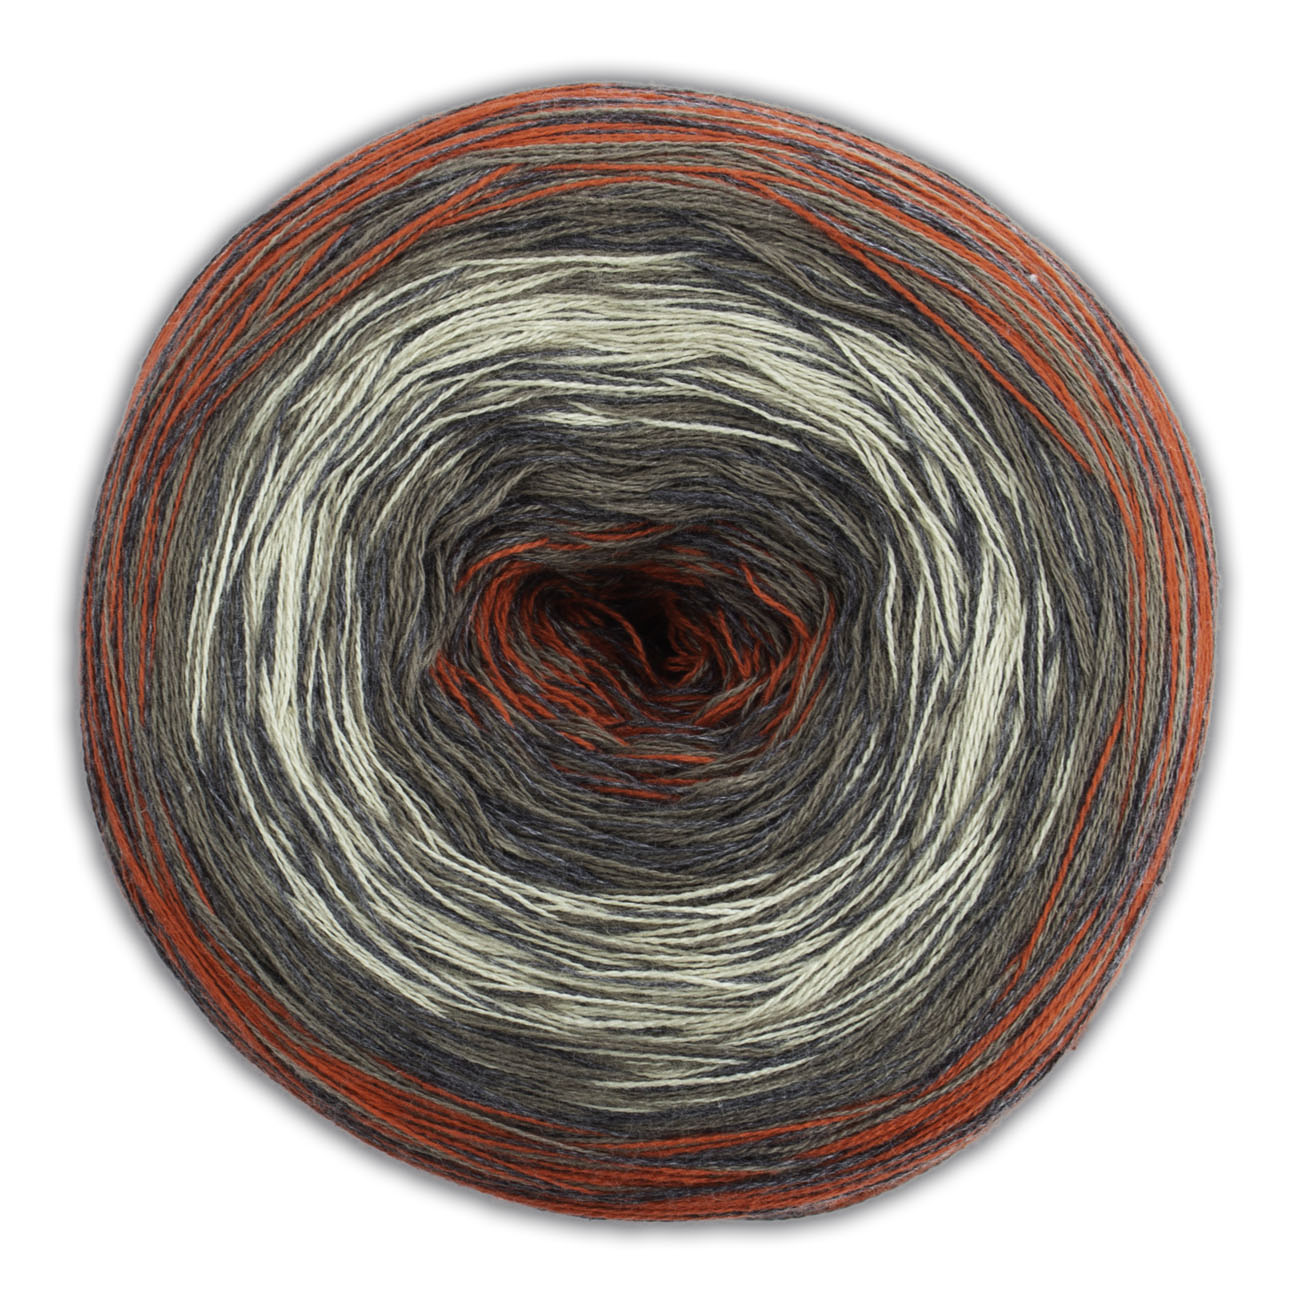 Woolly Hugs BOBBEL cotton MIRROR  200g 1kg